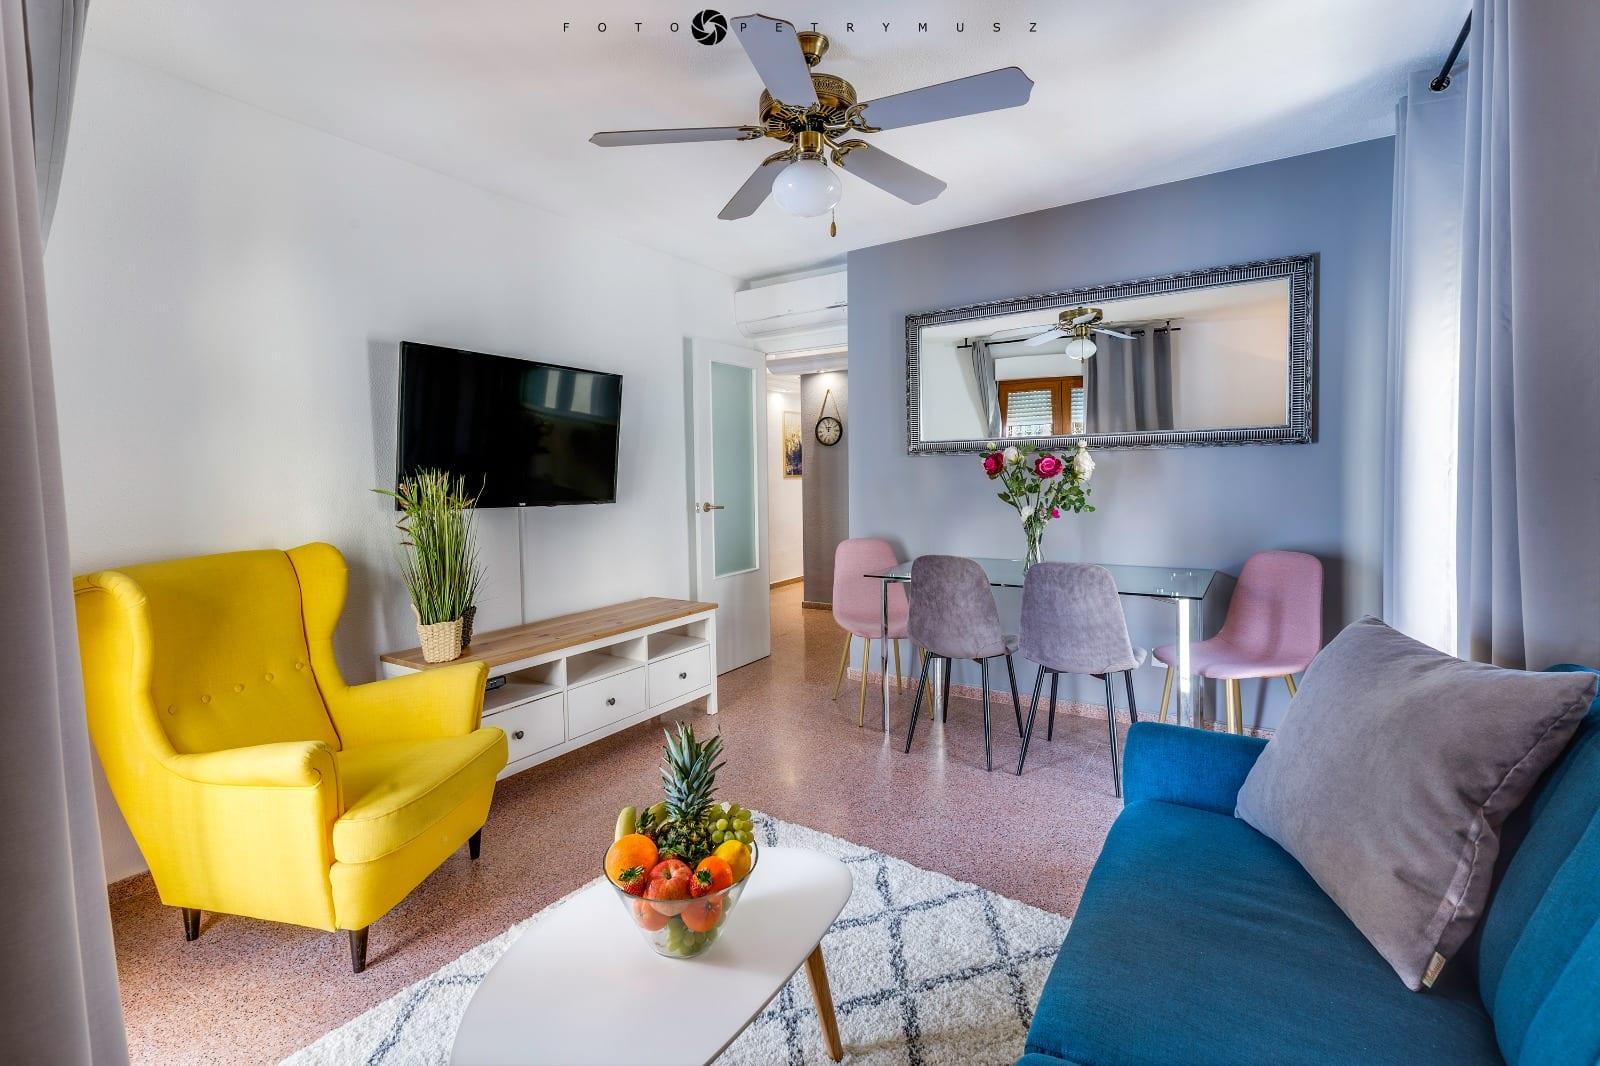 Casco Antiguo -Alicante  apartament z licencją turystyczną